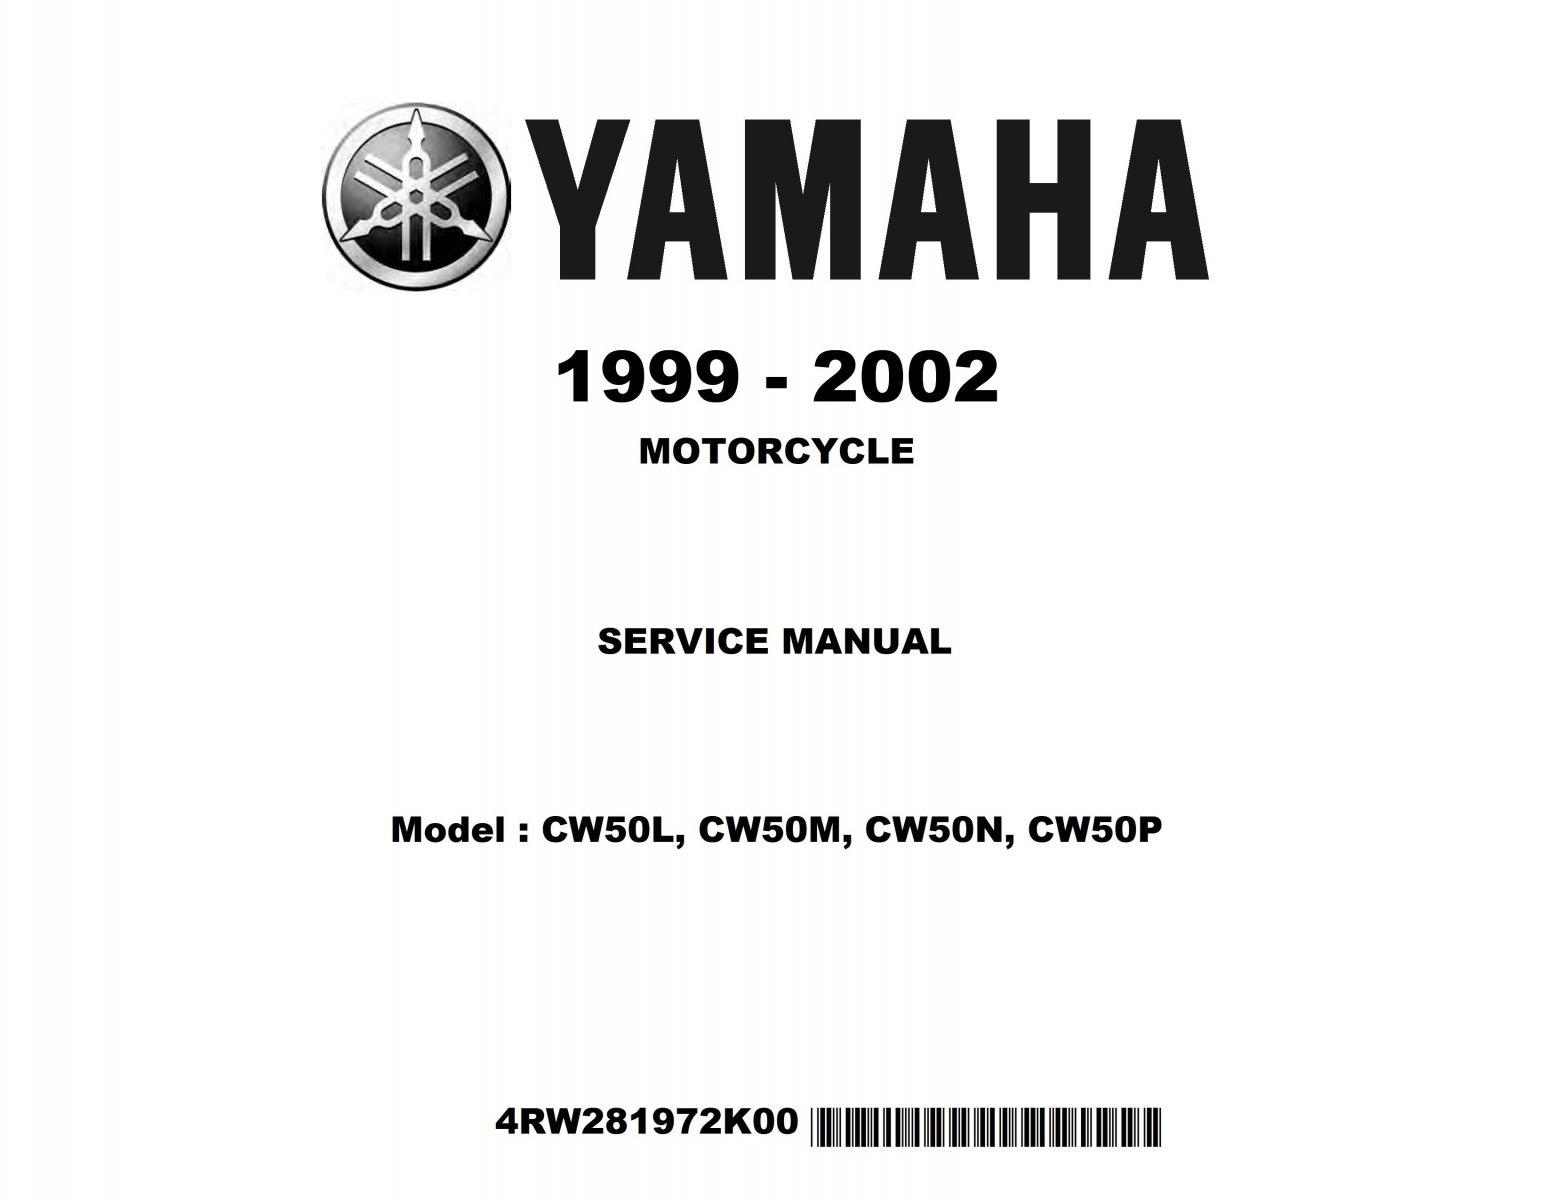 Yamaha CW50 Service Manual.jpg